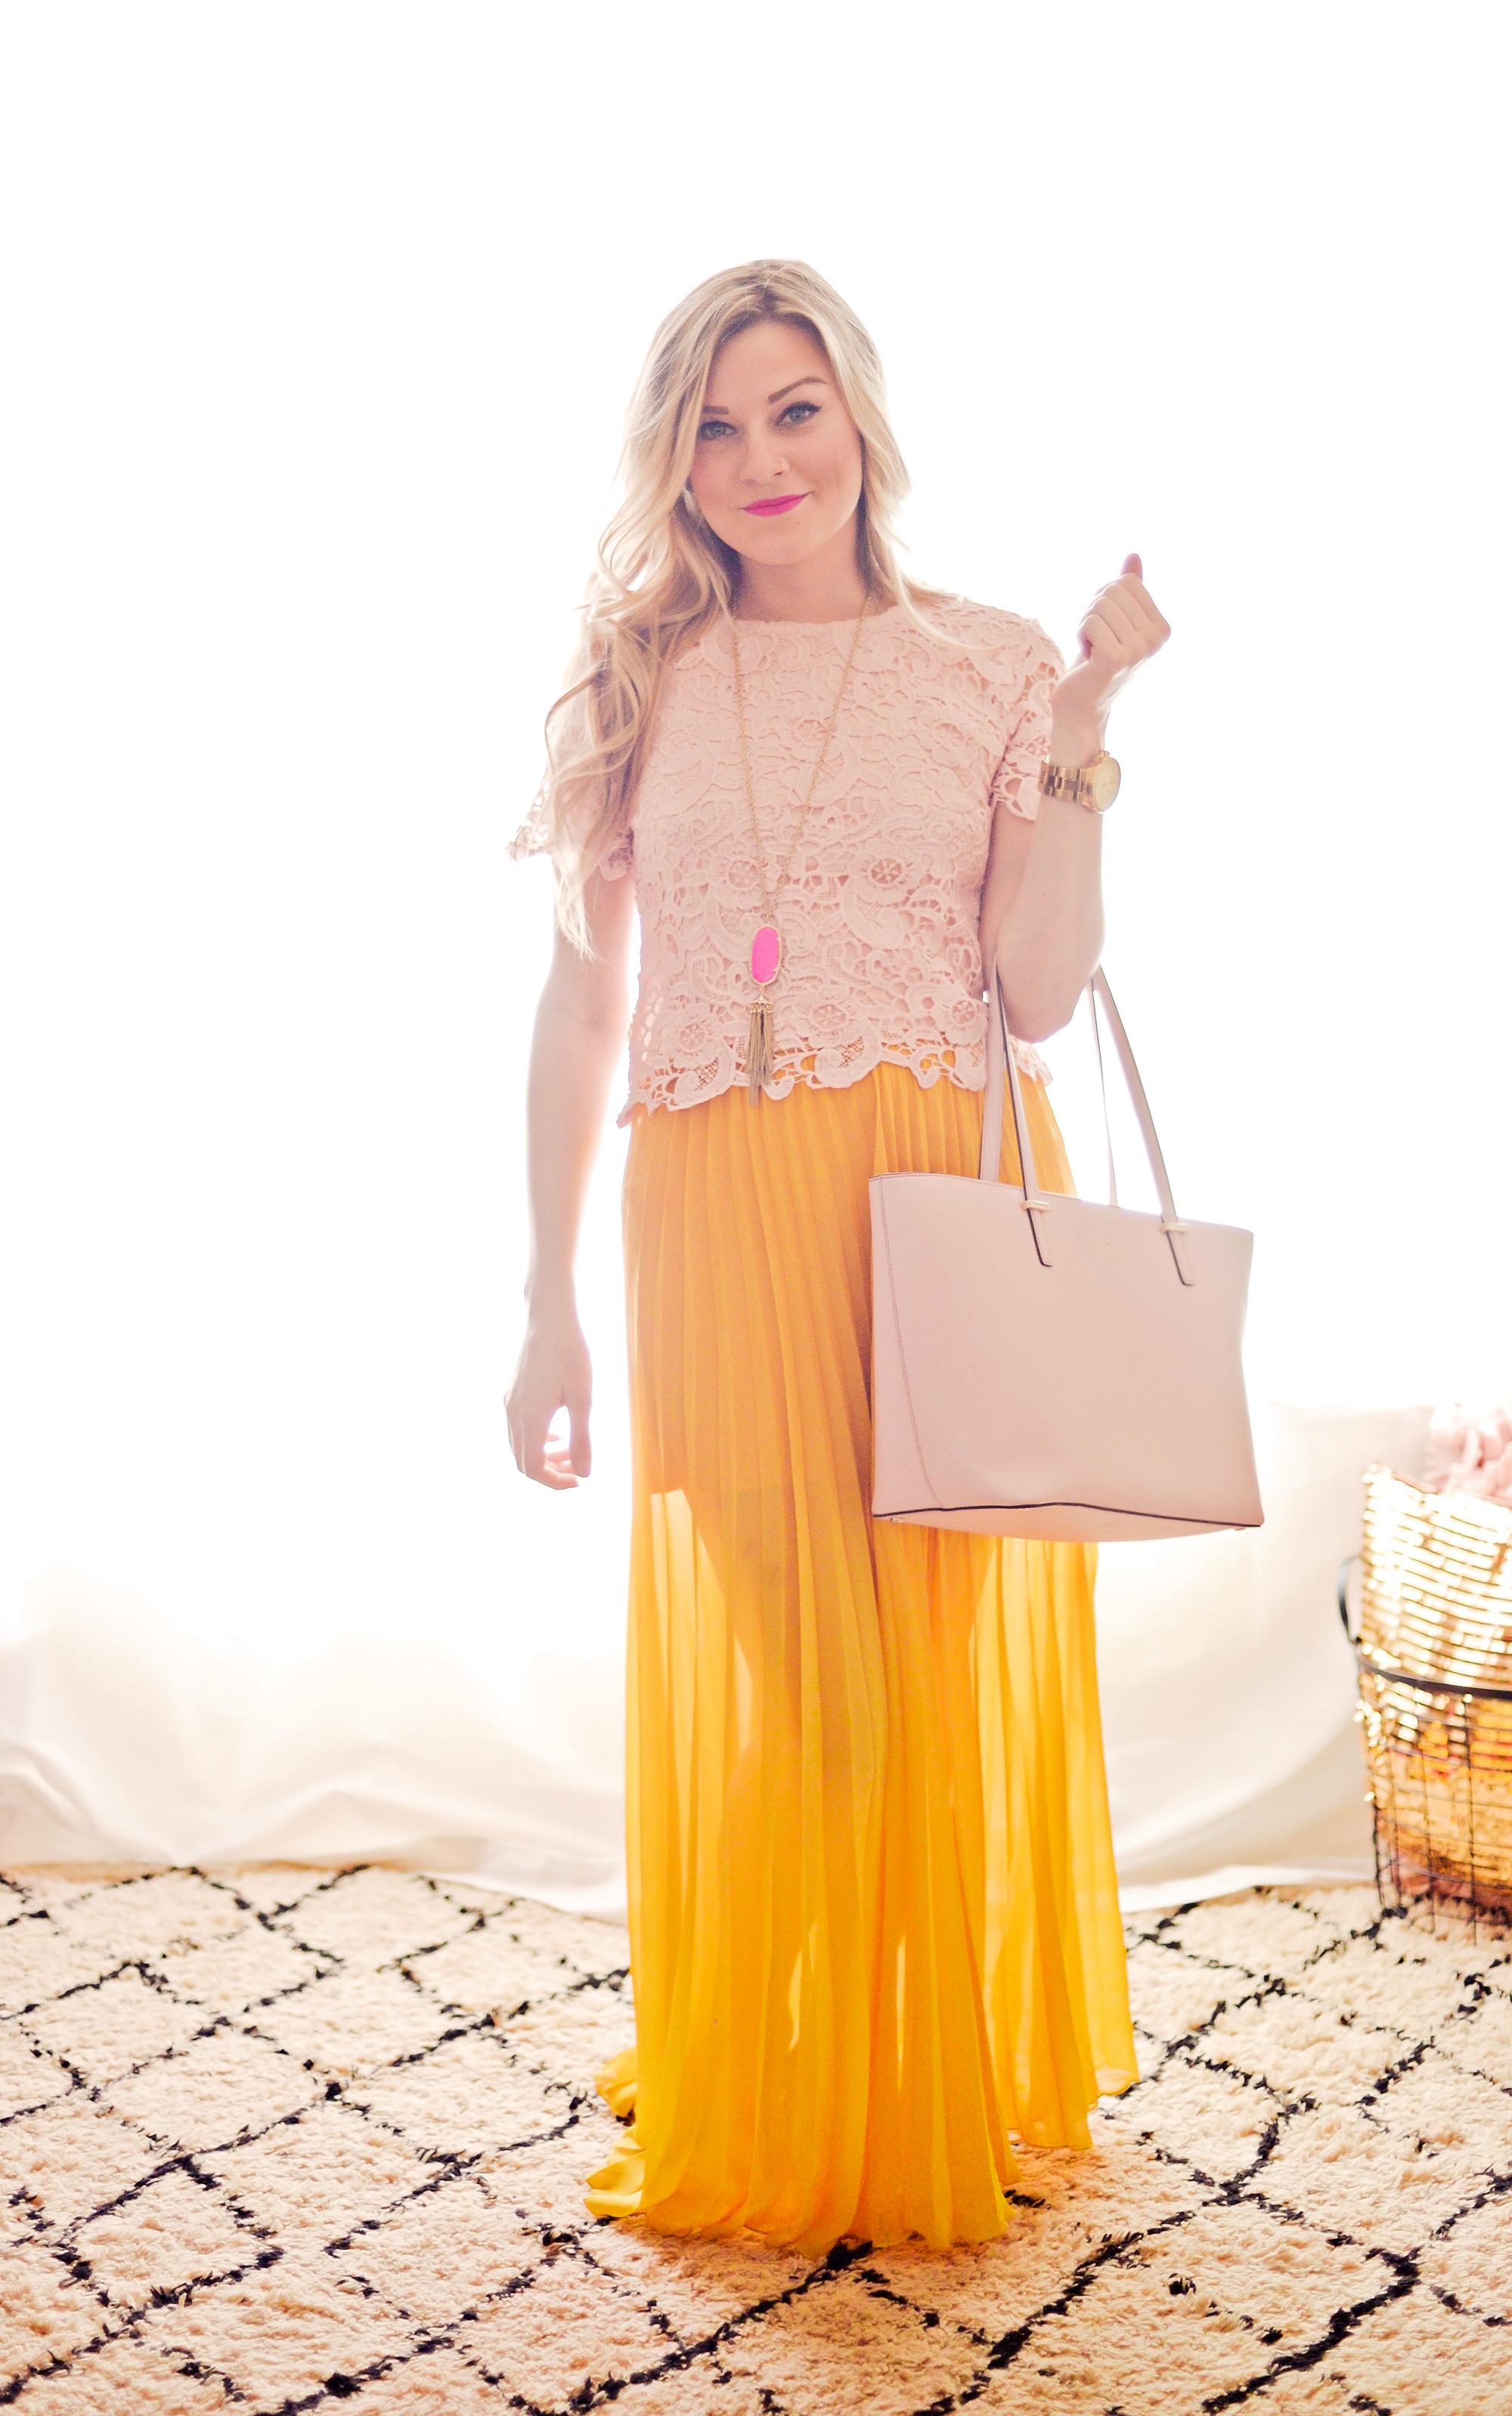 Pink Lemonade { The Chic Blonde }